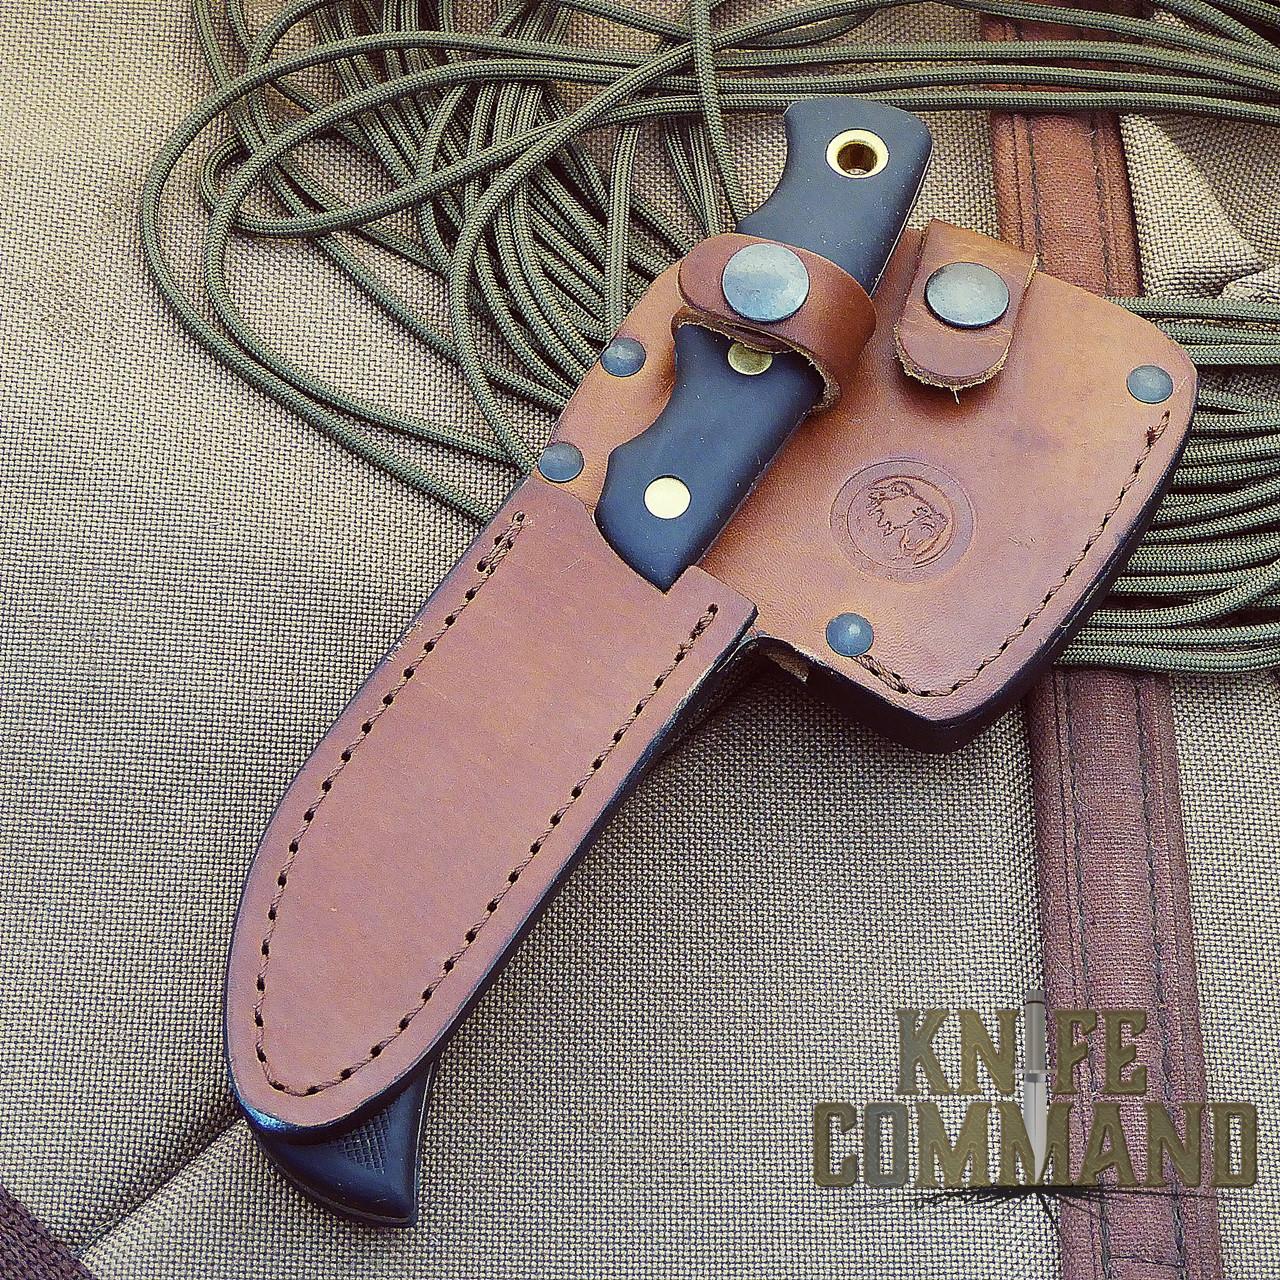 Knives of Alaska Bobcat Mini Hatchet Alpha Wolf Hunting Knife Combo.  Custom leather sheath holds both.